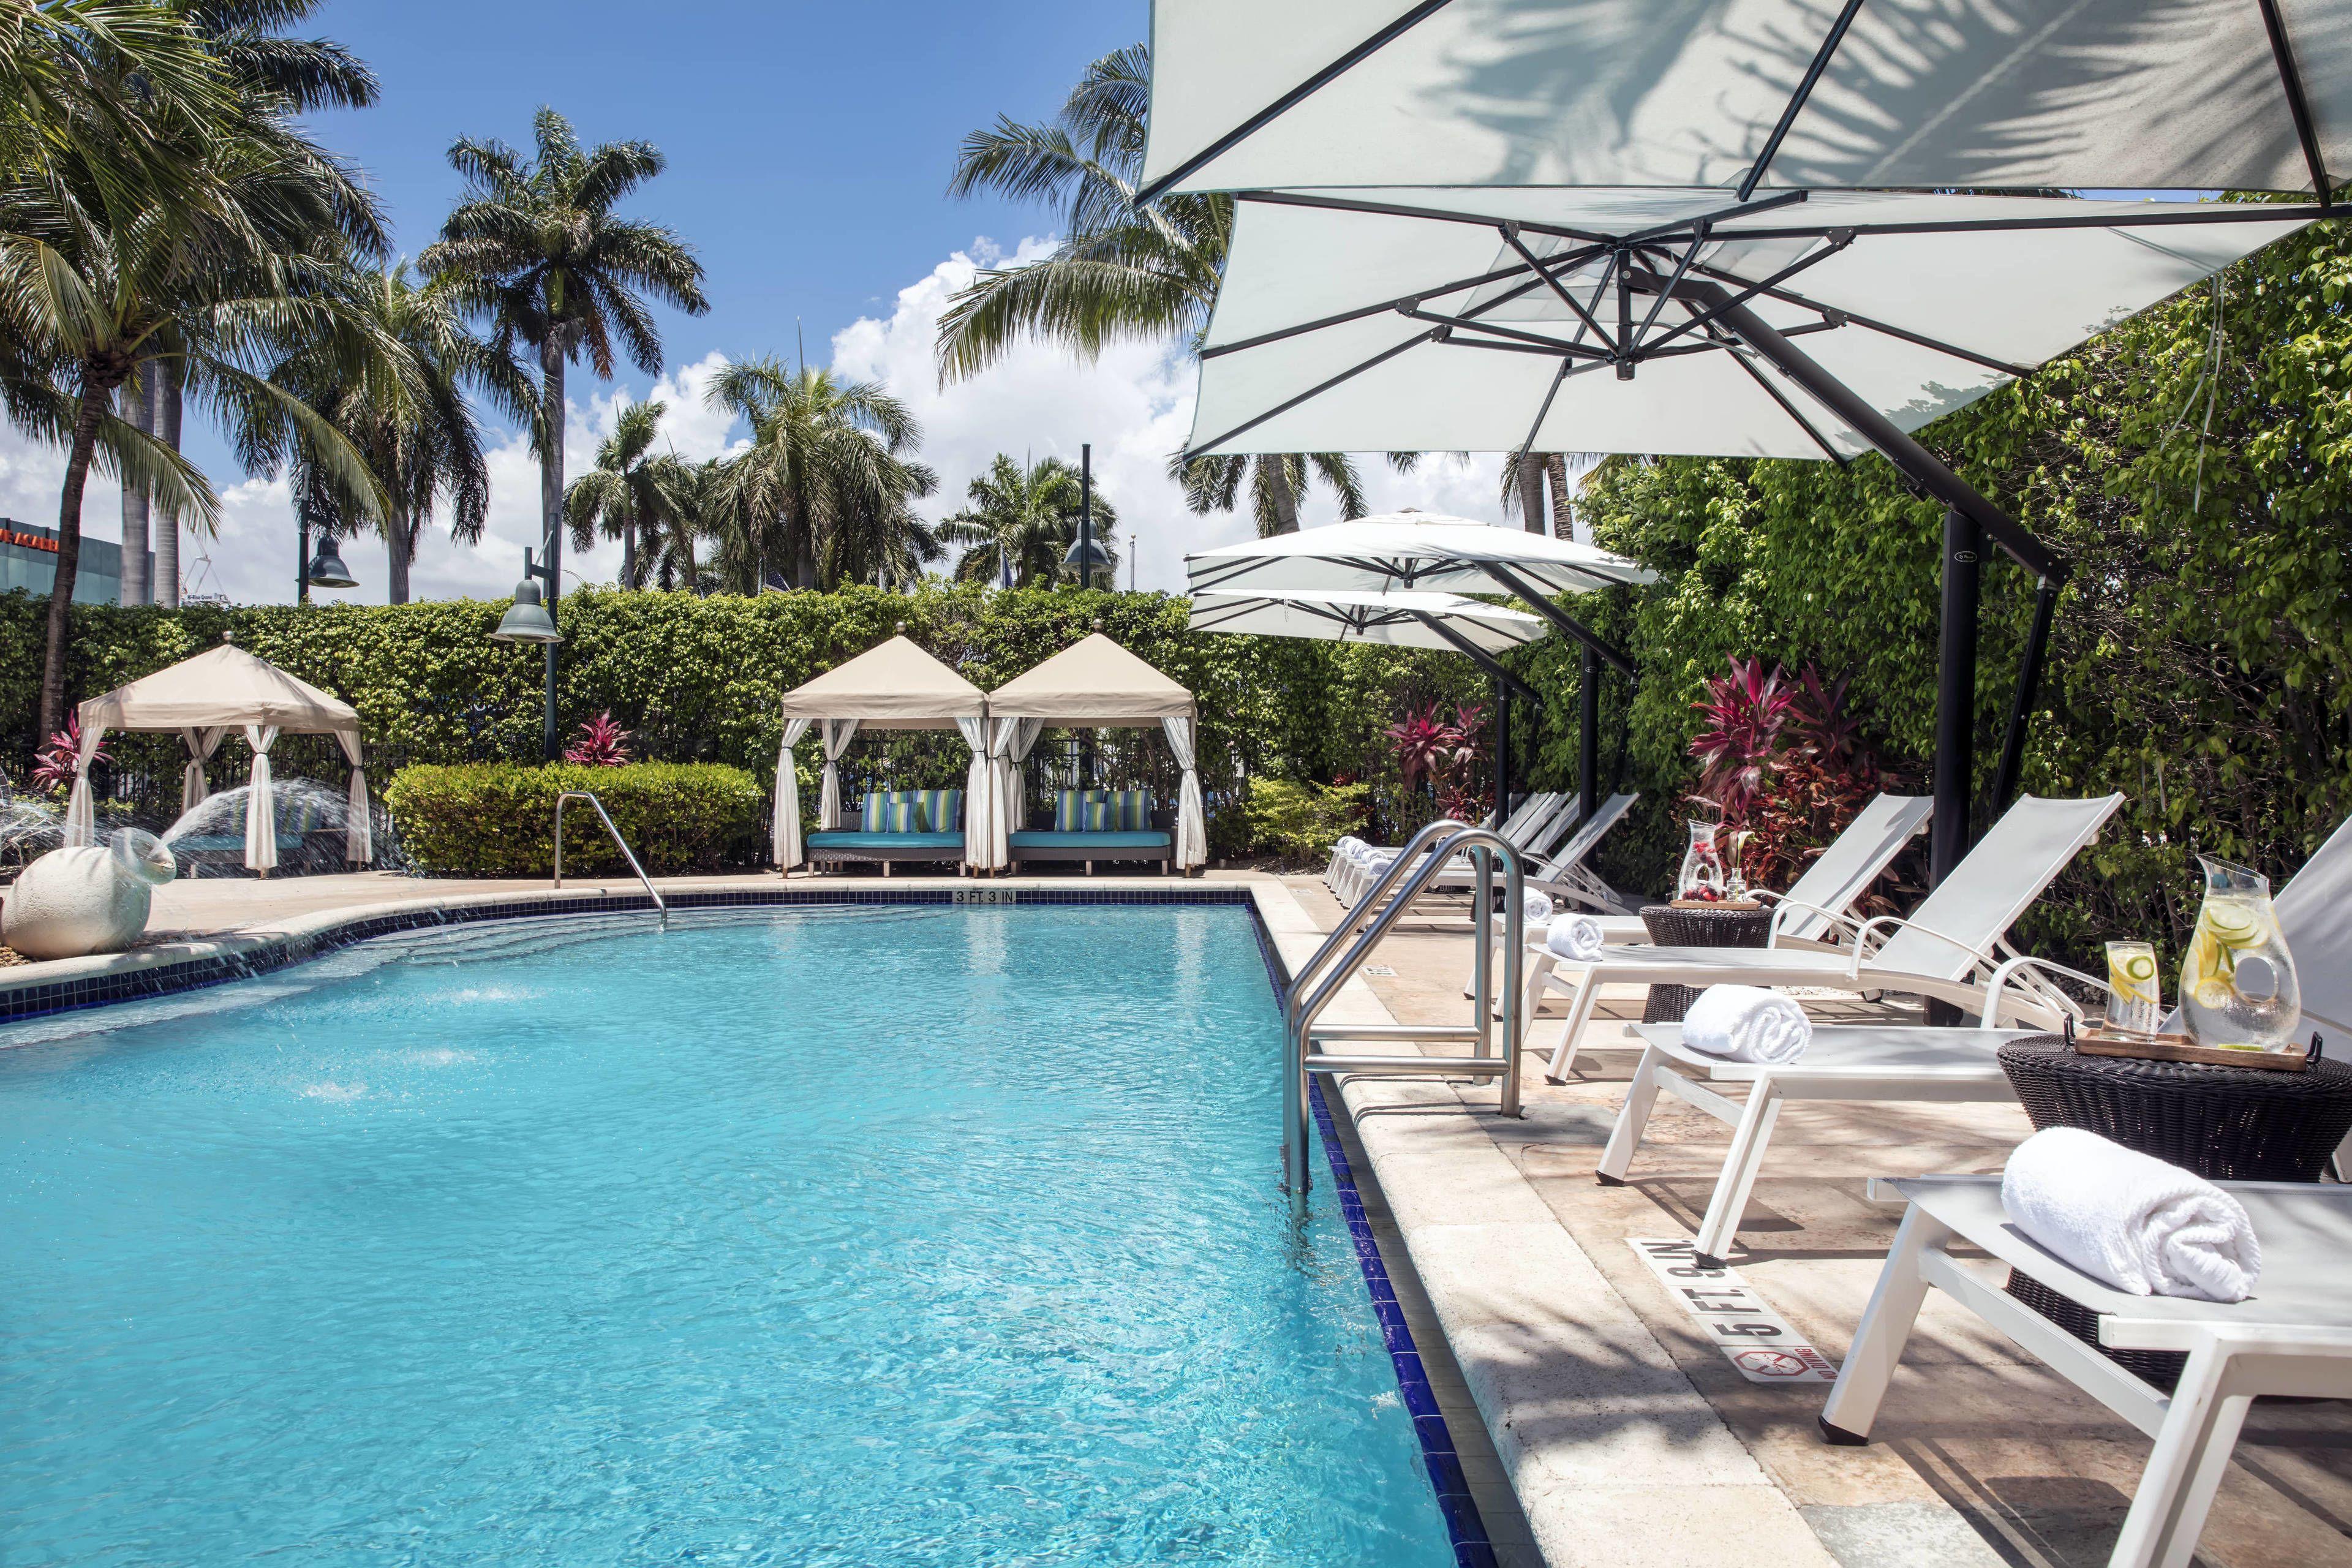 Courtesy of Renaissance Fort Lauderdale Cruise Port Hotel / Expedia